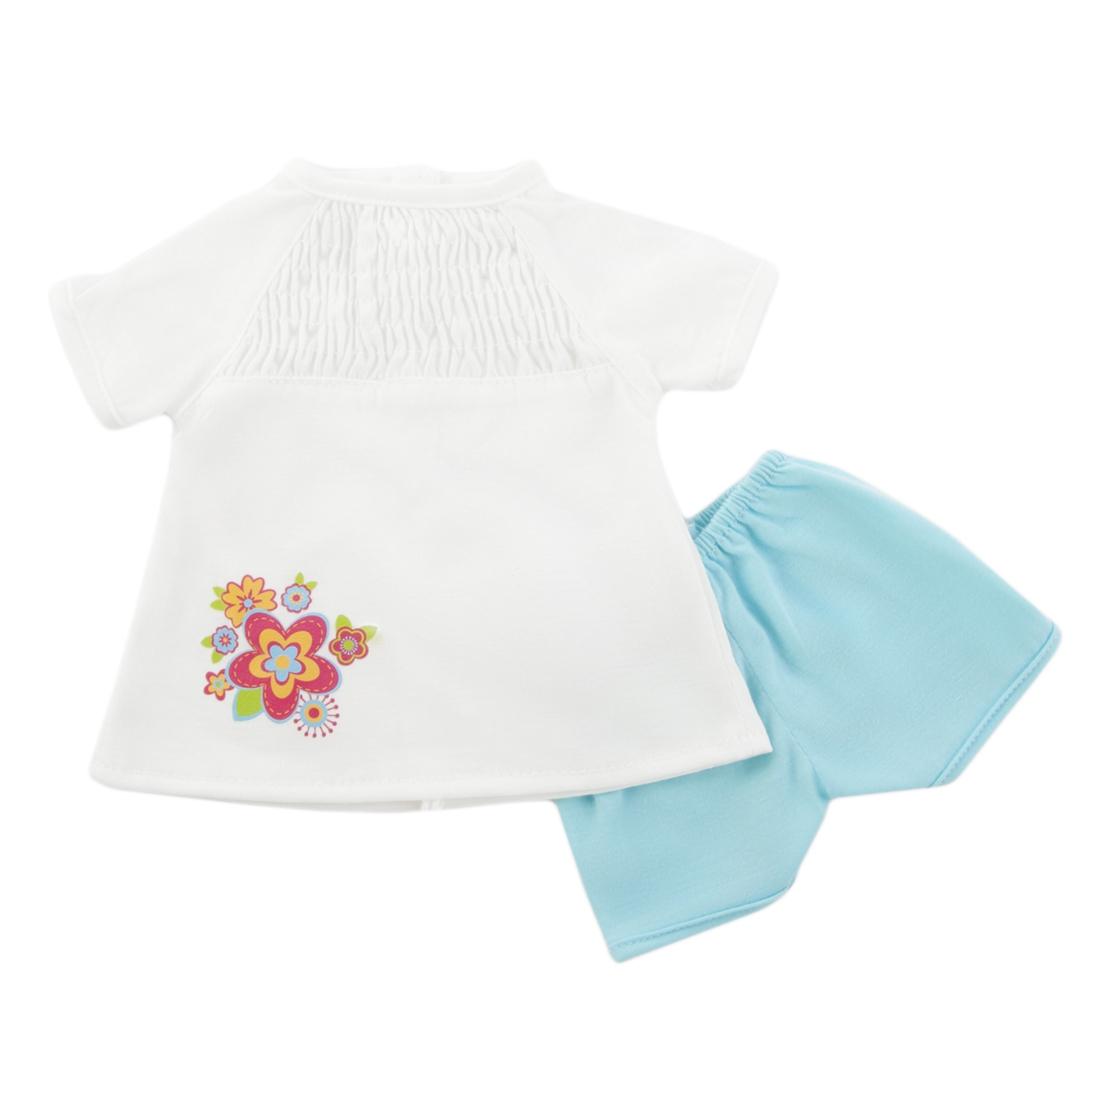 Одежда для кукол Mary Poppins Кофточка и штанишки для куклы Mary Poppins игрушечная бытовая техника mary poppins умный дом